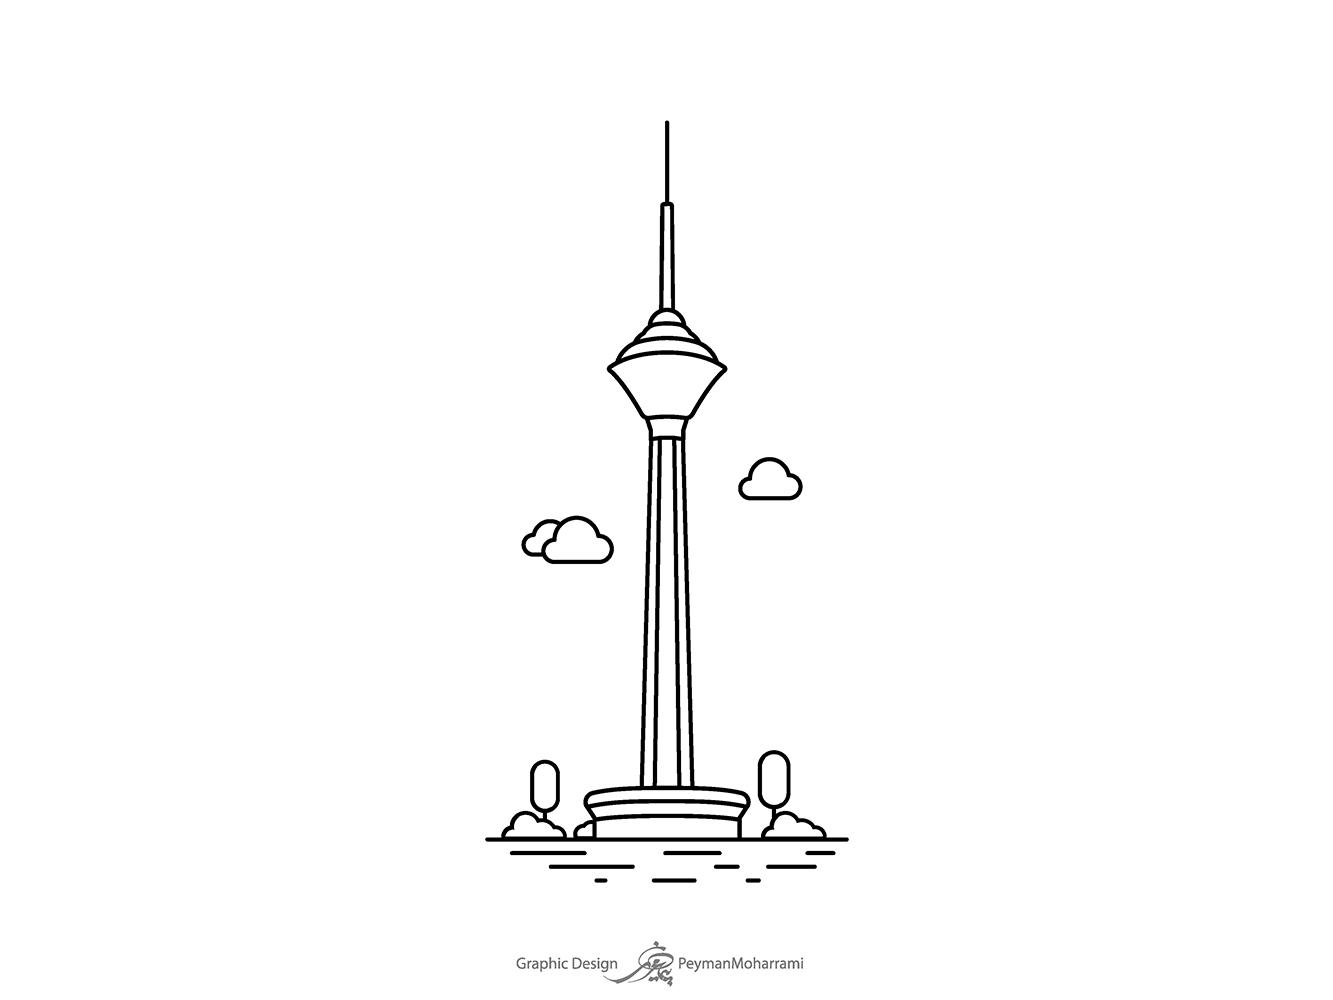 Milad Tower برج میلاد milad twer tower bridge icon abstract vector illustration design illustration agency illustrator tower illustration art graphic flat logo art illustration design adobe